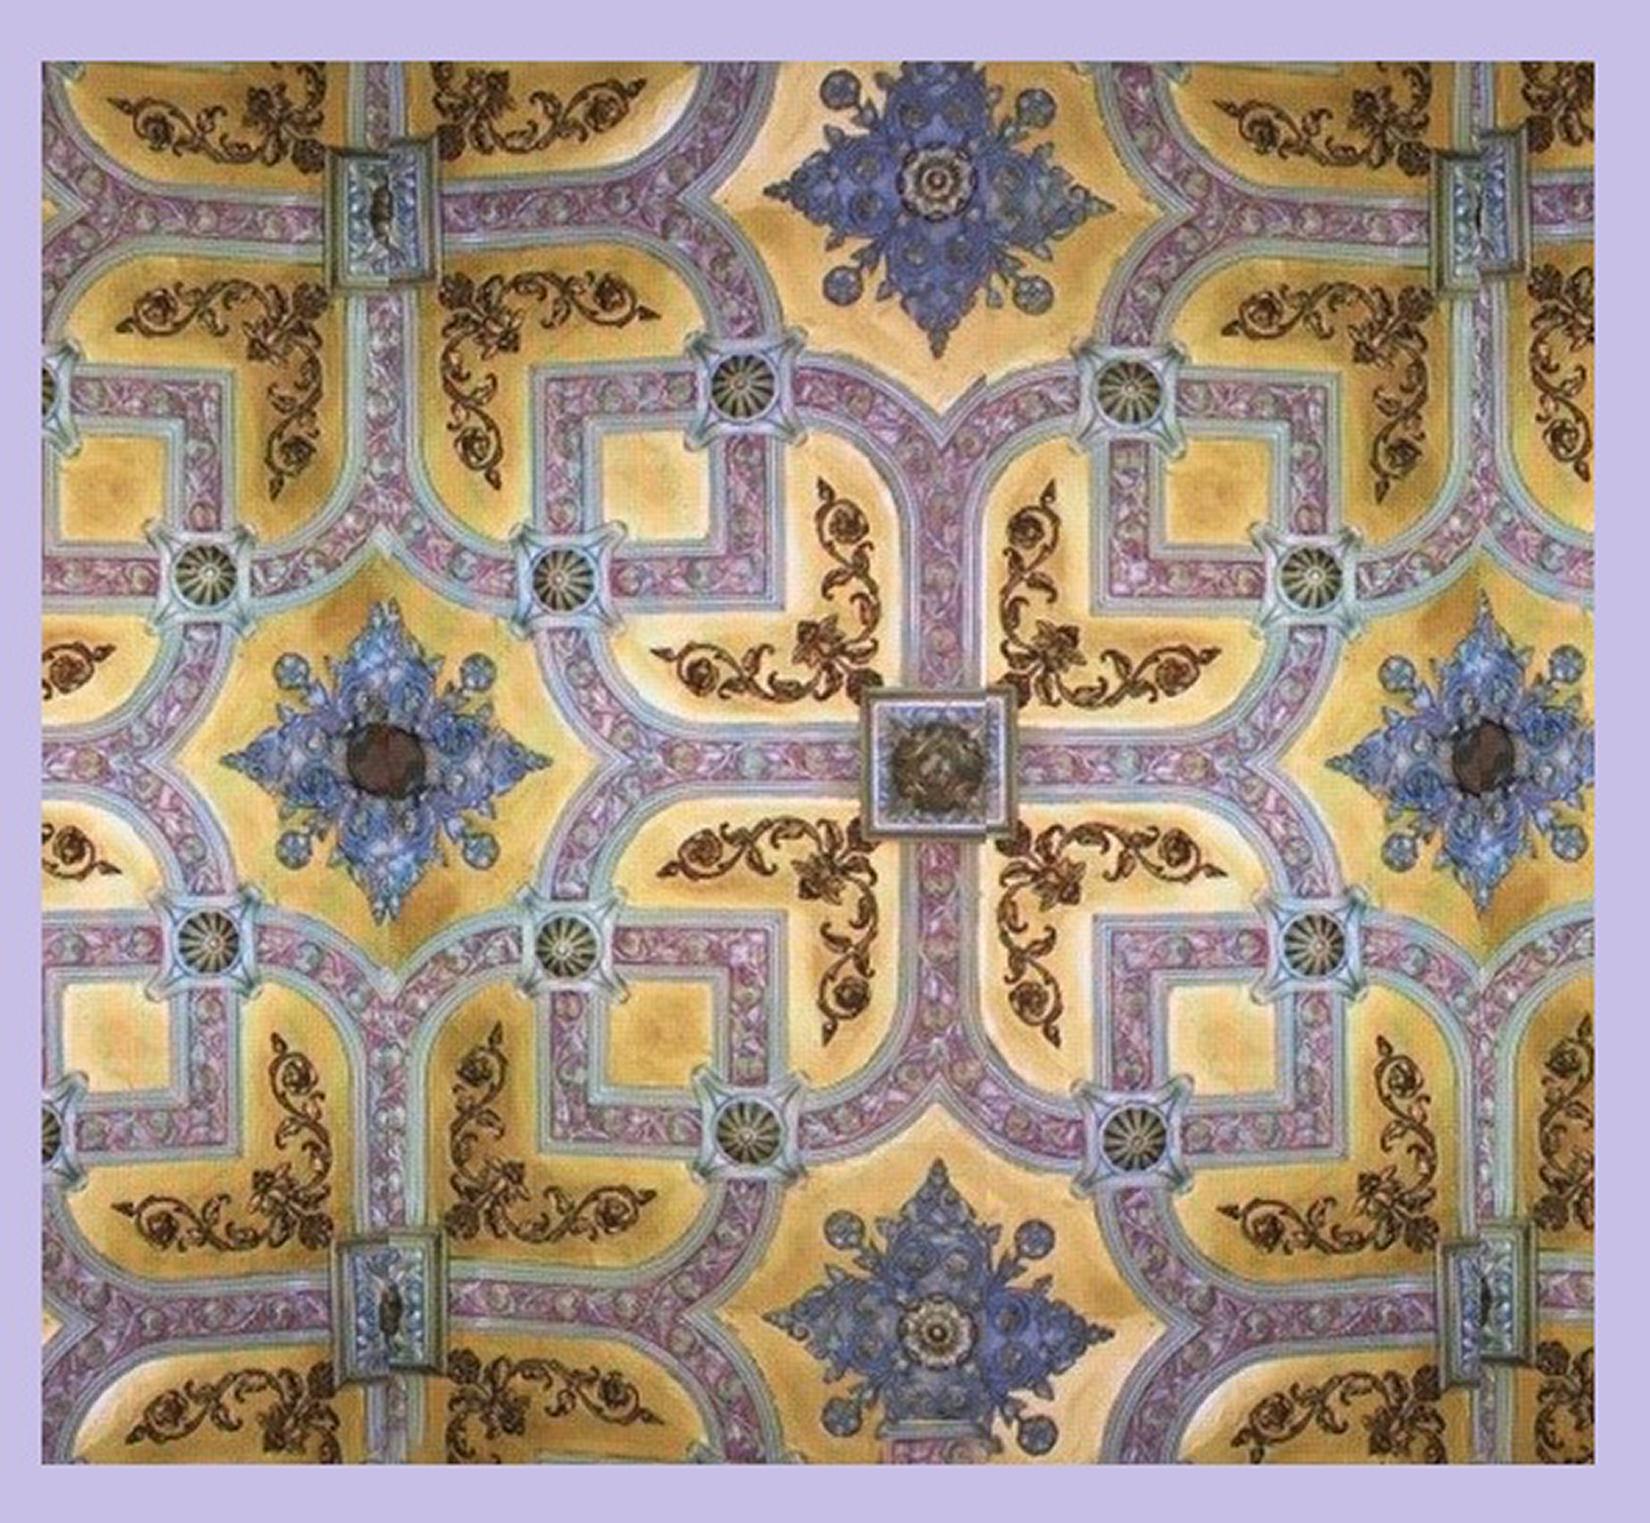 101 c handkerchief.jpg